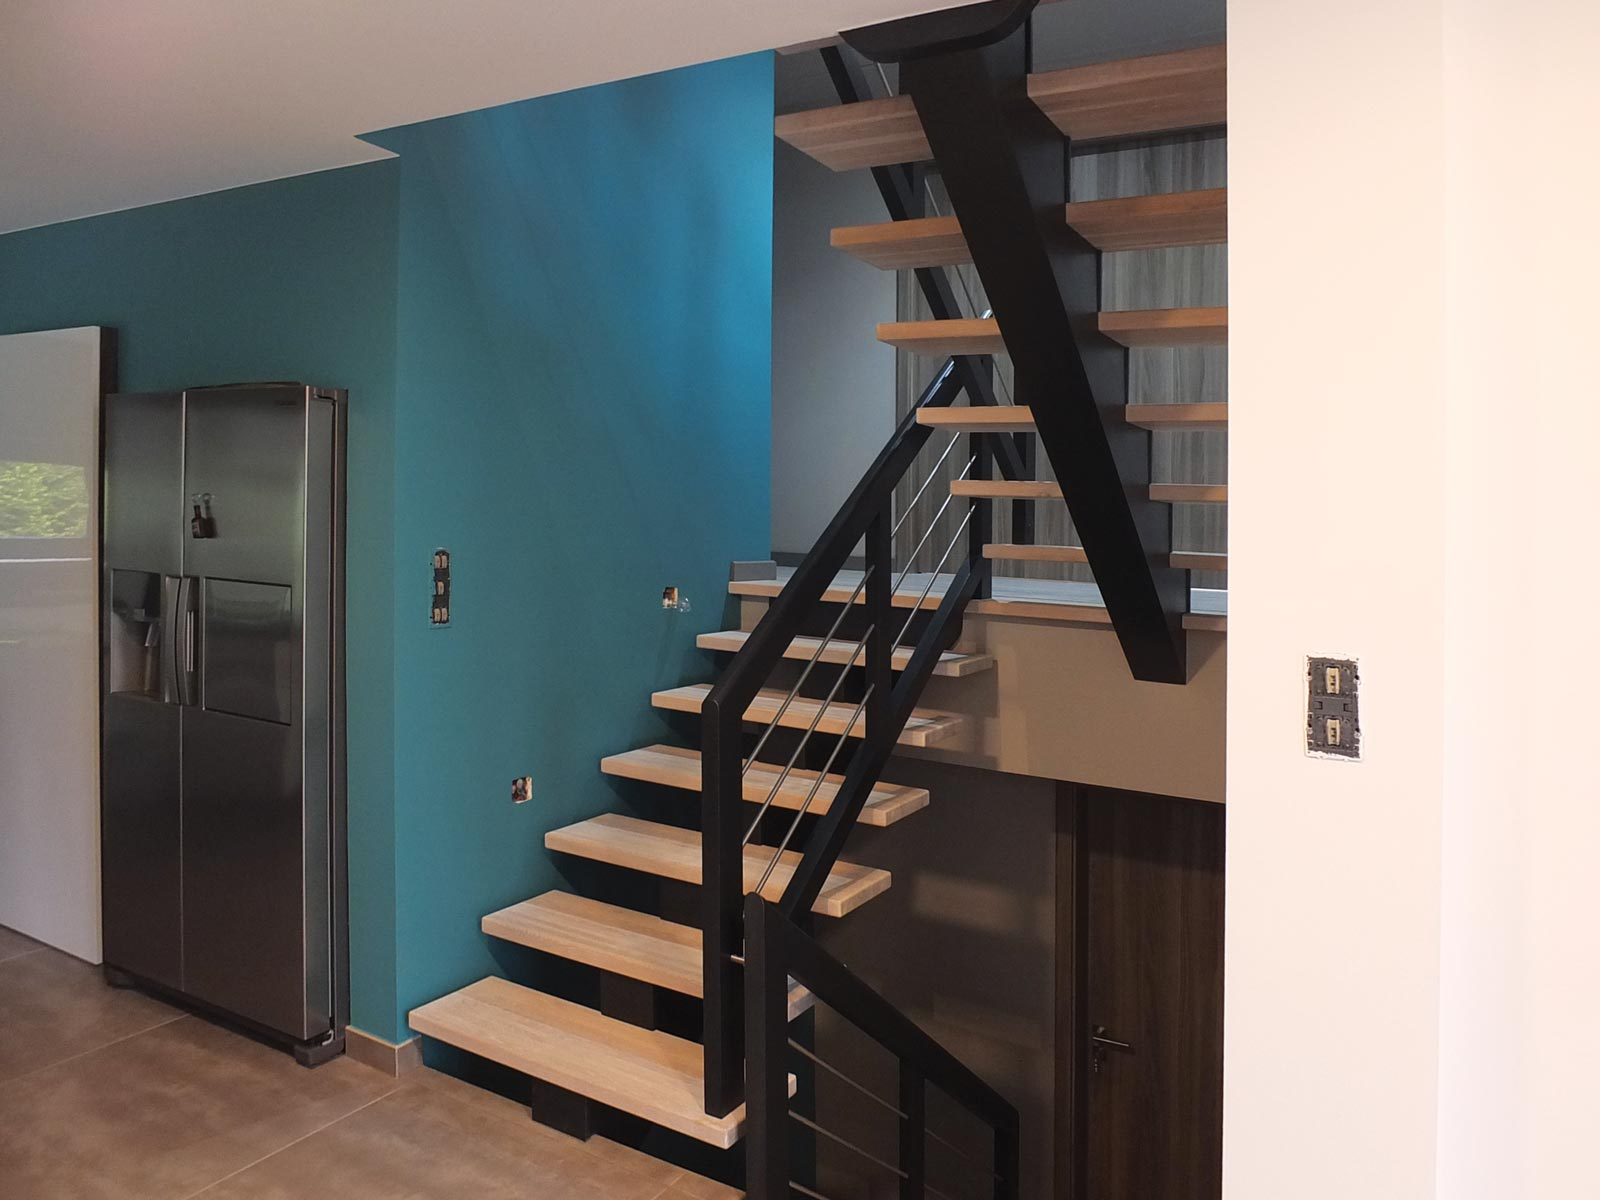 escalier limon central 6 ambiance escalier. Black Bedroom Furniture Sets. Home Design Ideas